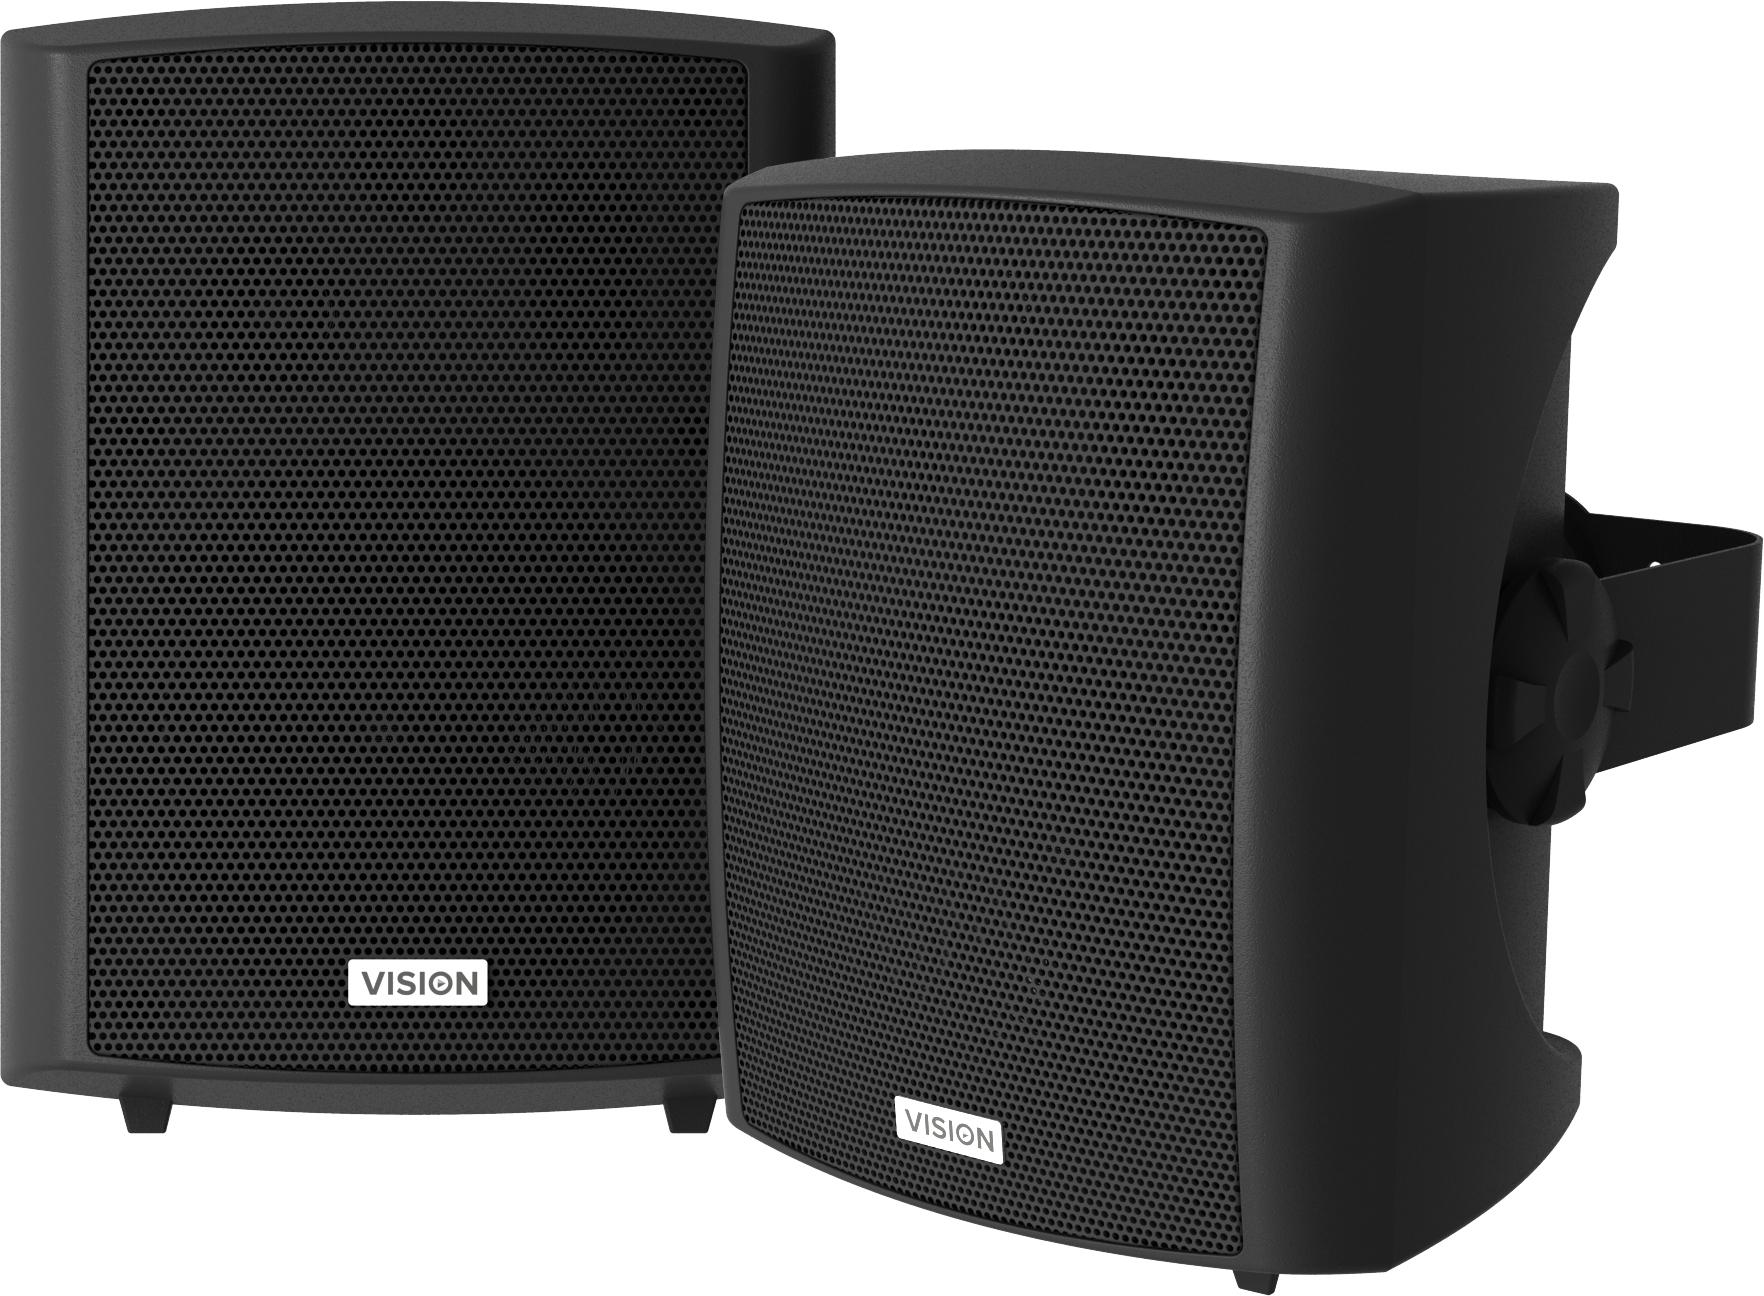 Vision SP-1800 50W Black loudspeaker